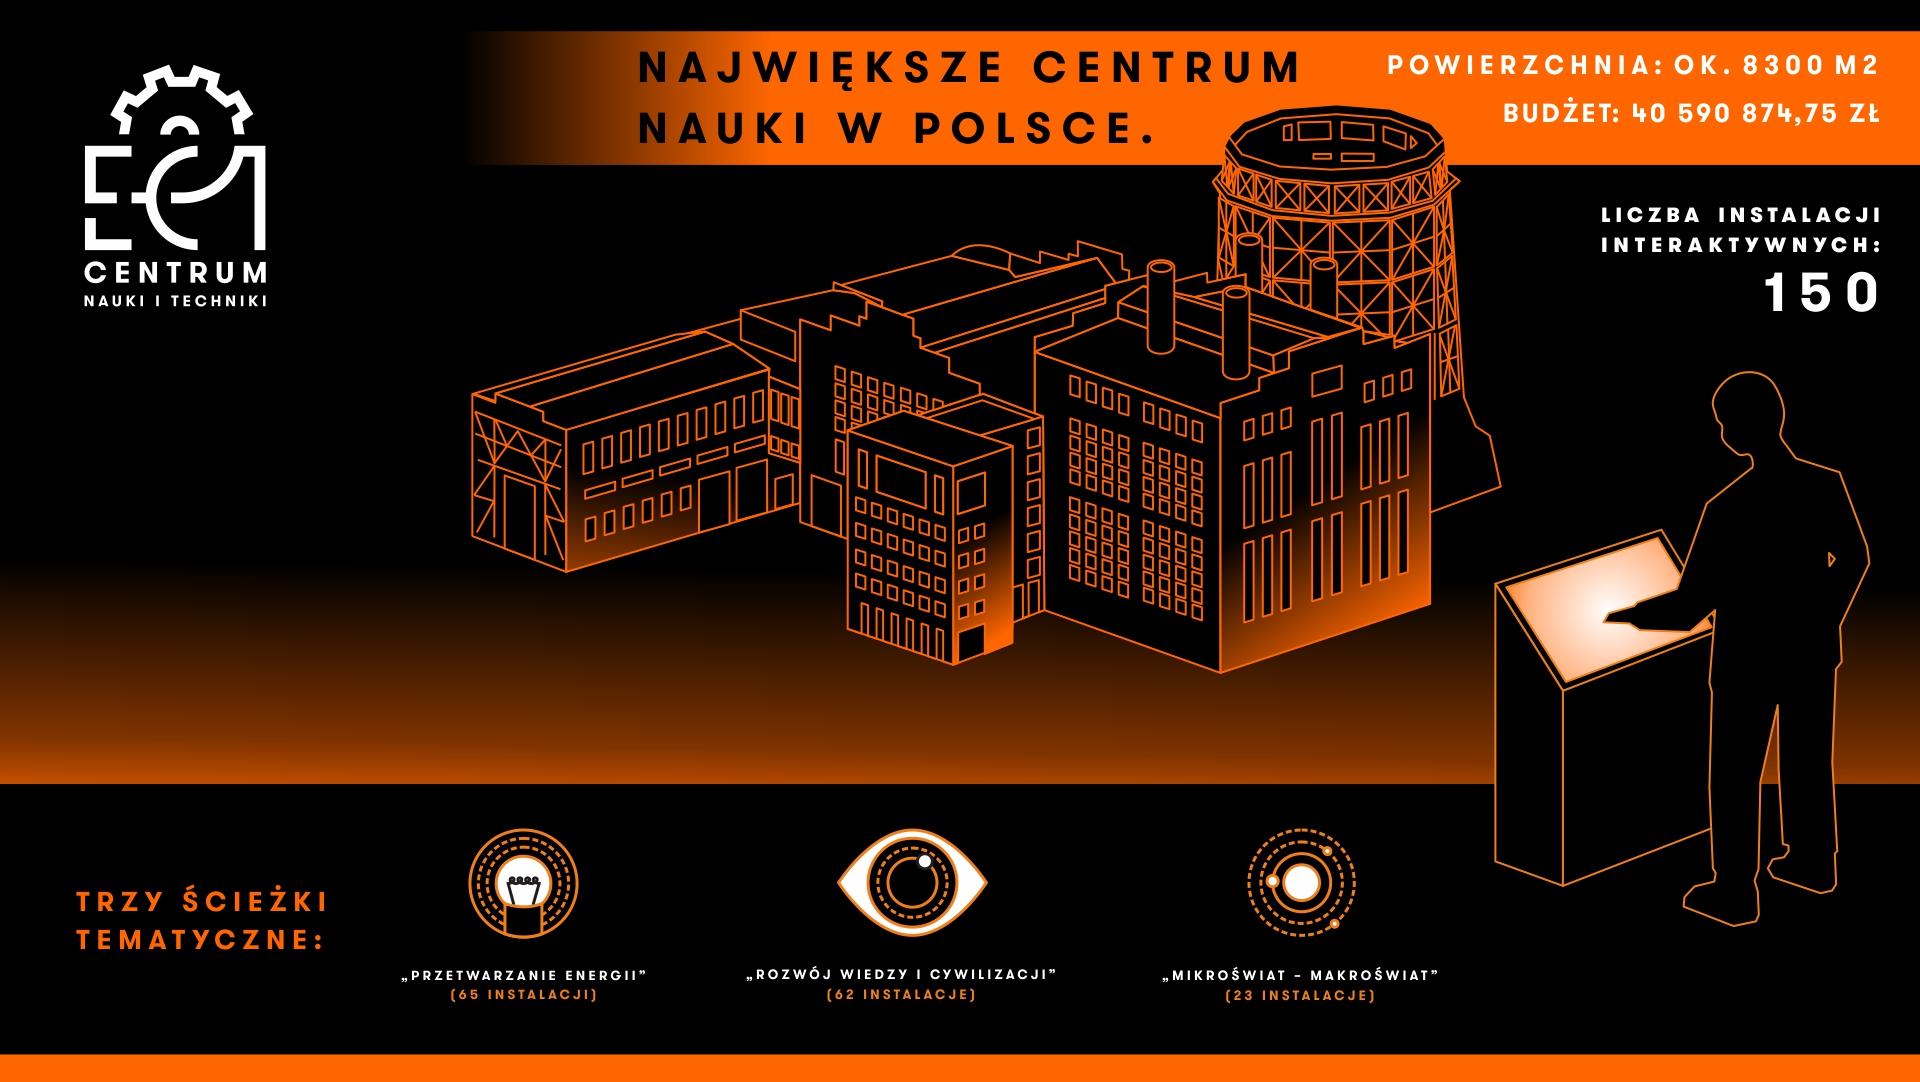 EC1_Centrum_Nauki_i_techniki_-_1920x1080_c